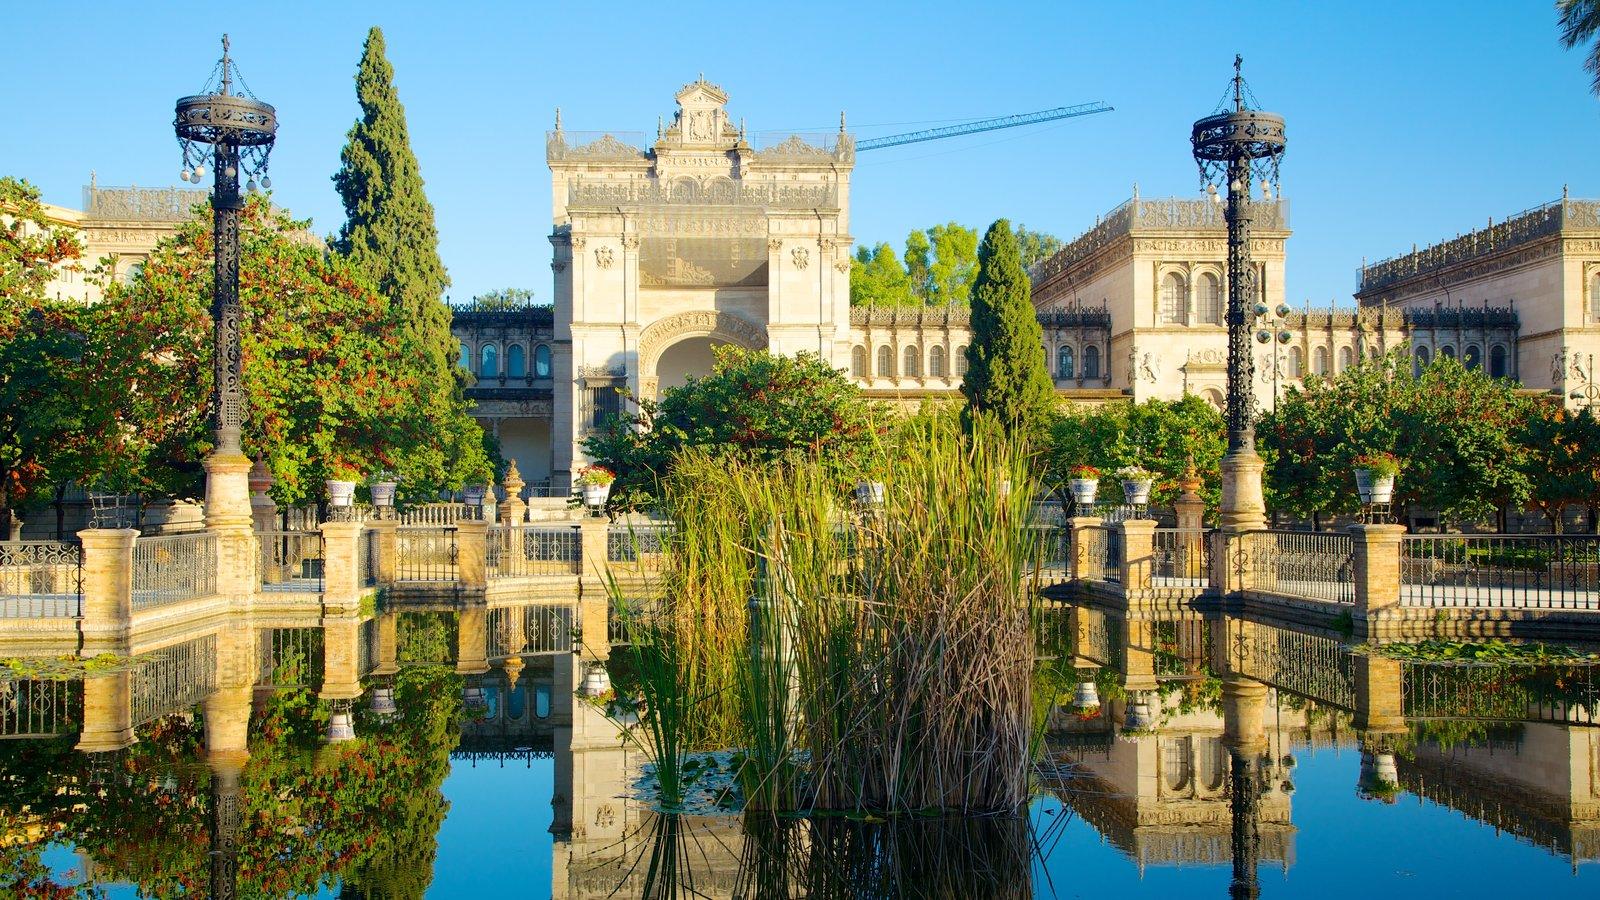 Parque de María Luisa que inclui um lago e arquitetura de patrimônio